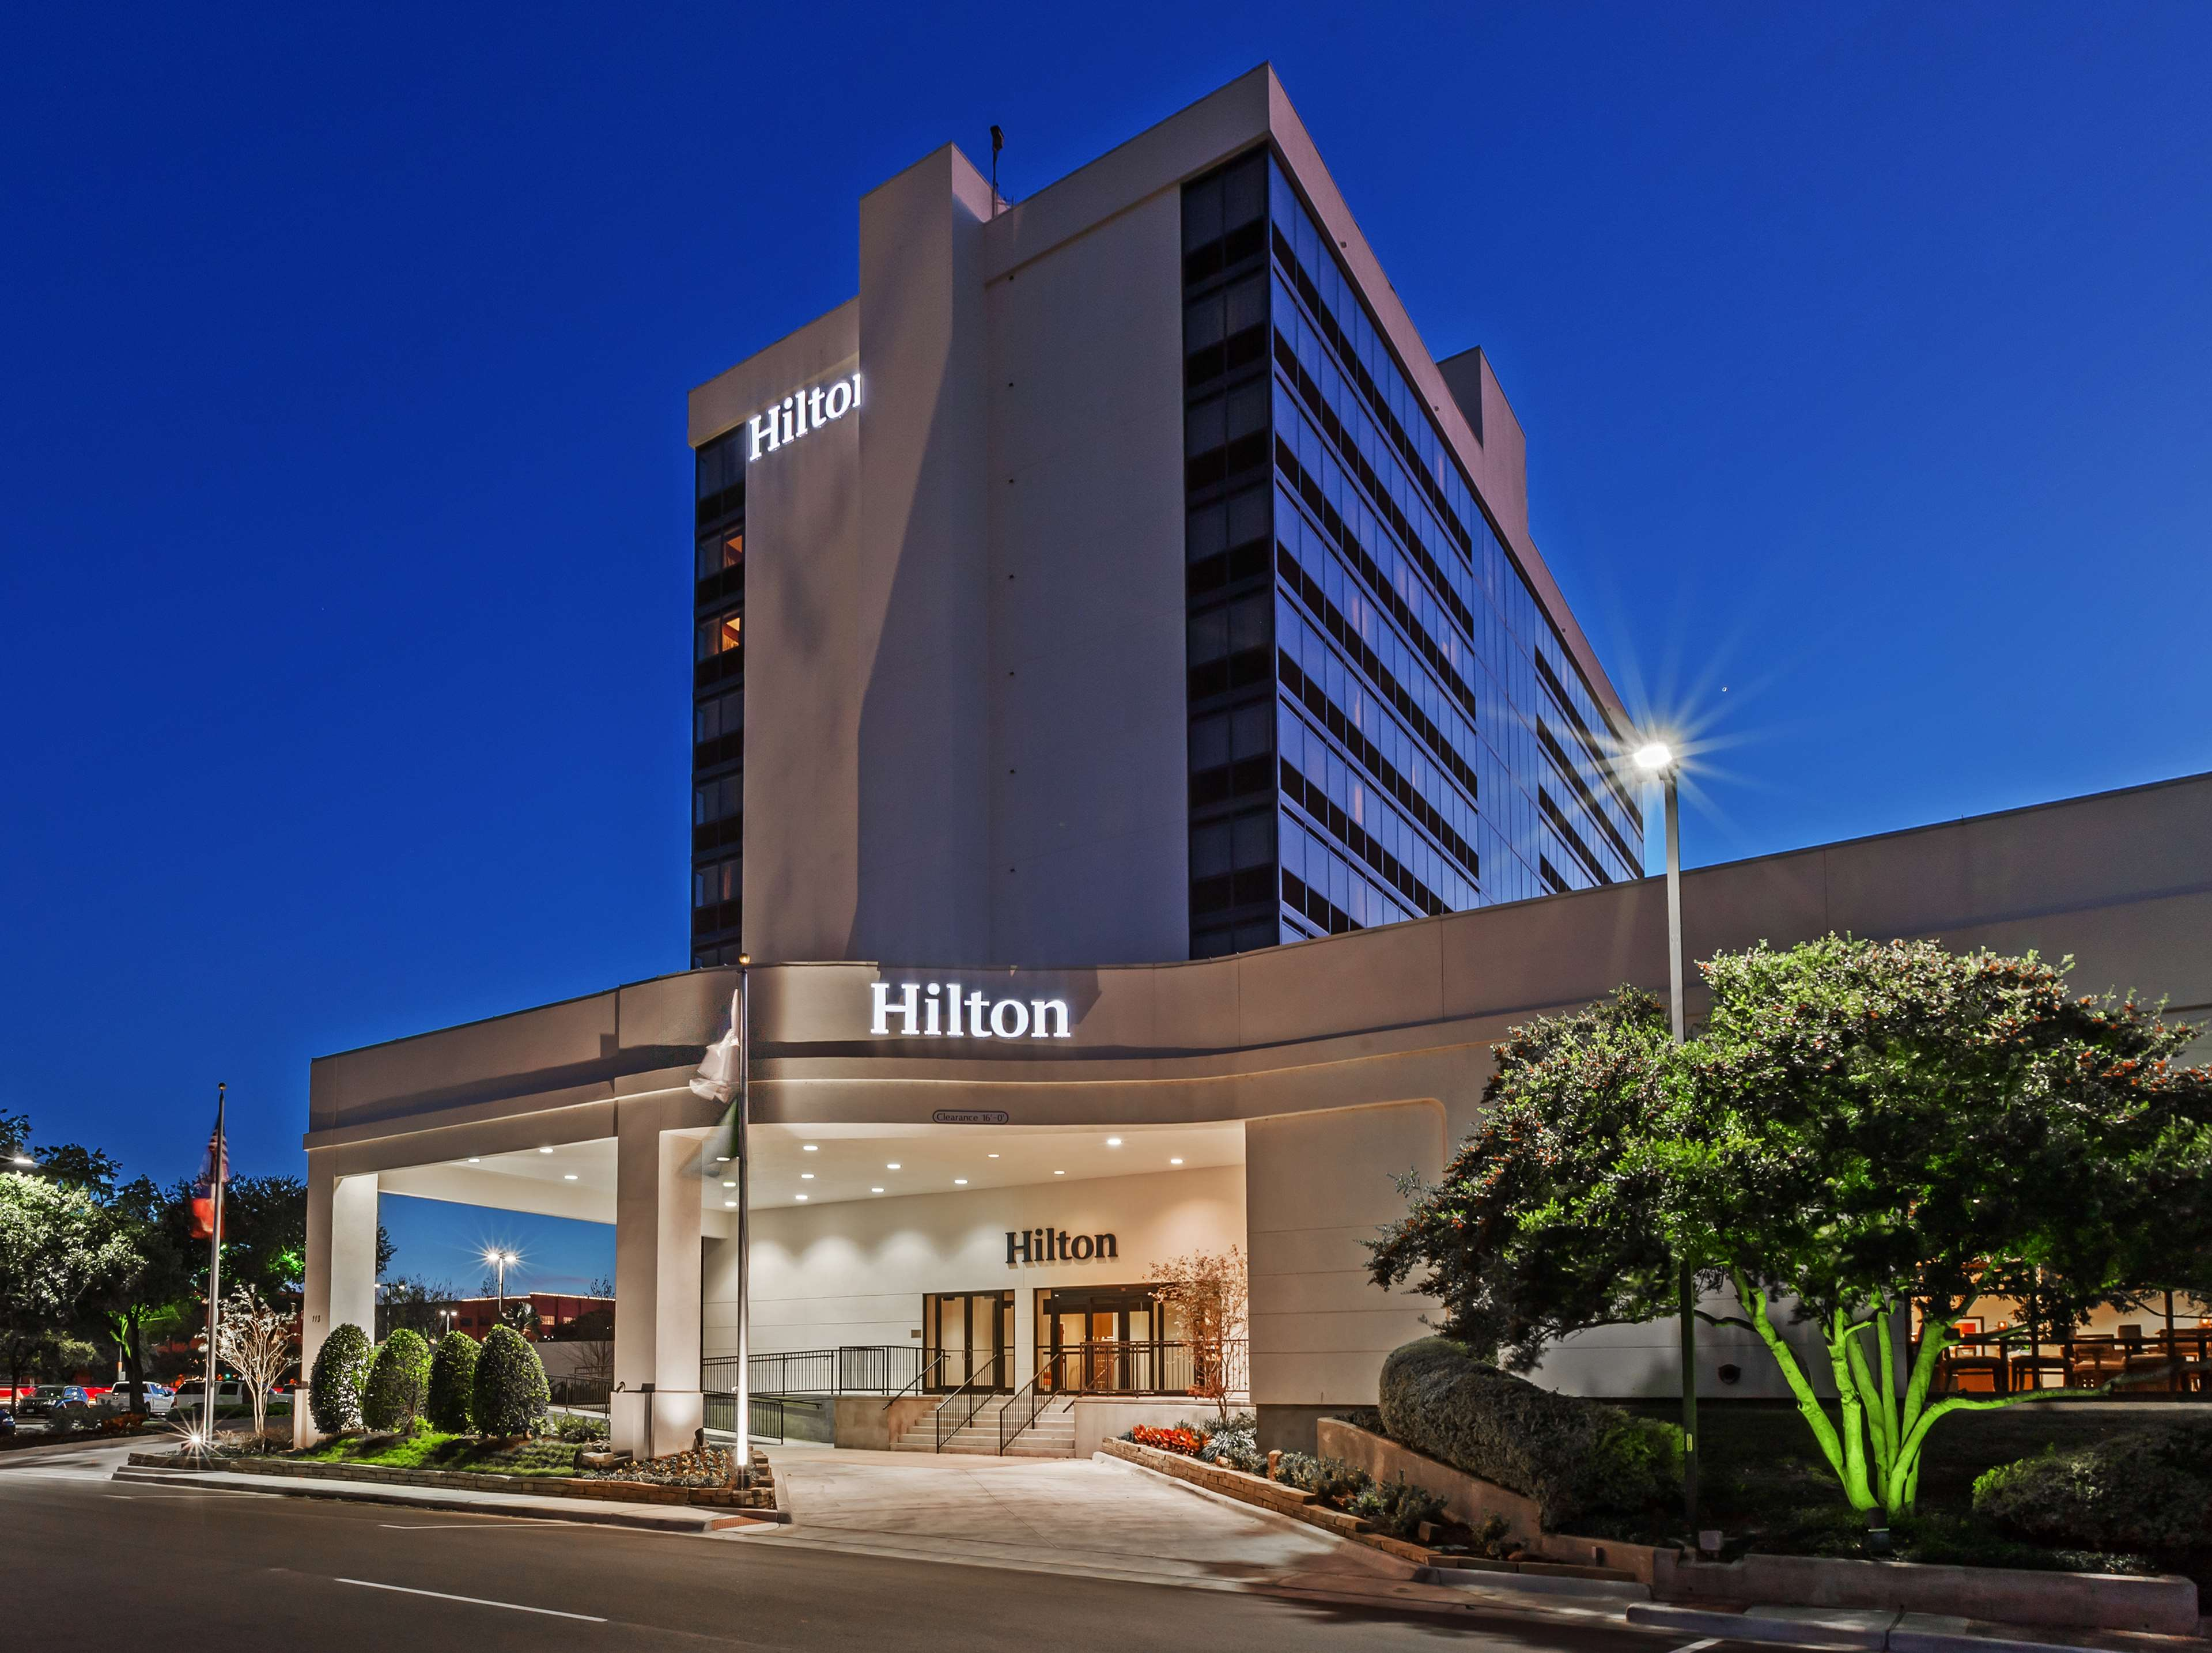 Hilton Waco image 6